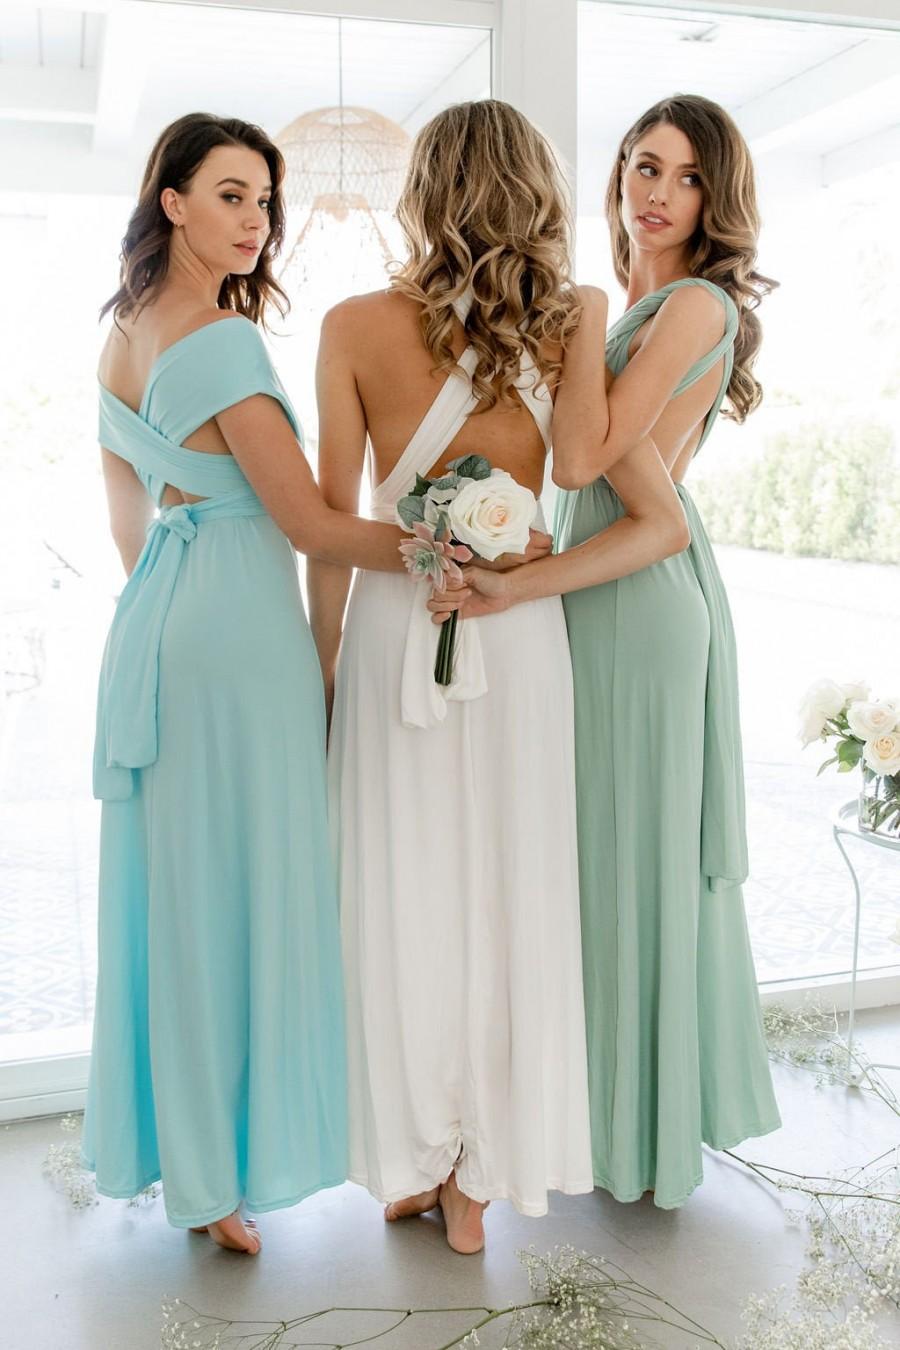 Mariage - Bridesmaid Dress/ Infinity Bridesmaid Dress/ Convertible Wedding Dress/ Wrap Dress/ Prom Dress/ Multiway Bridesmaid Dress (Bridesmaid Dress)